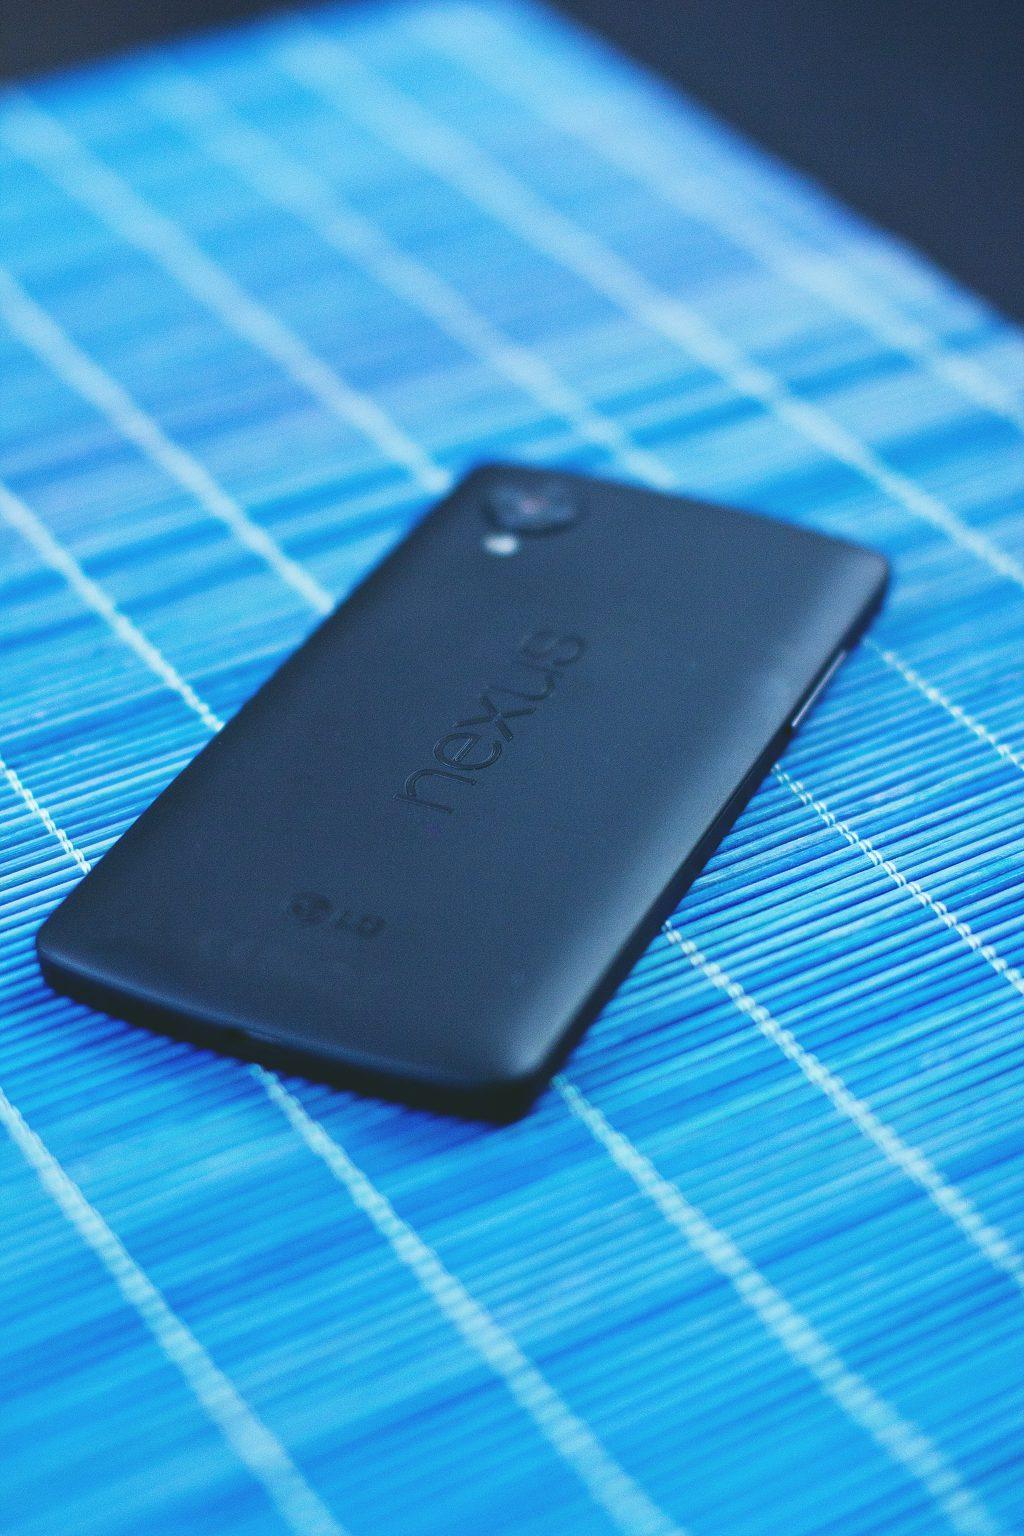 Google Nexus 5 LG - free stock photo